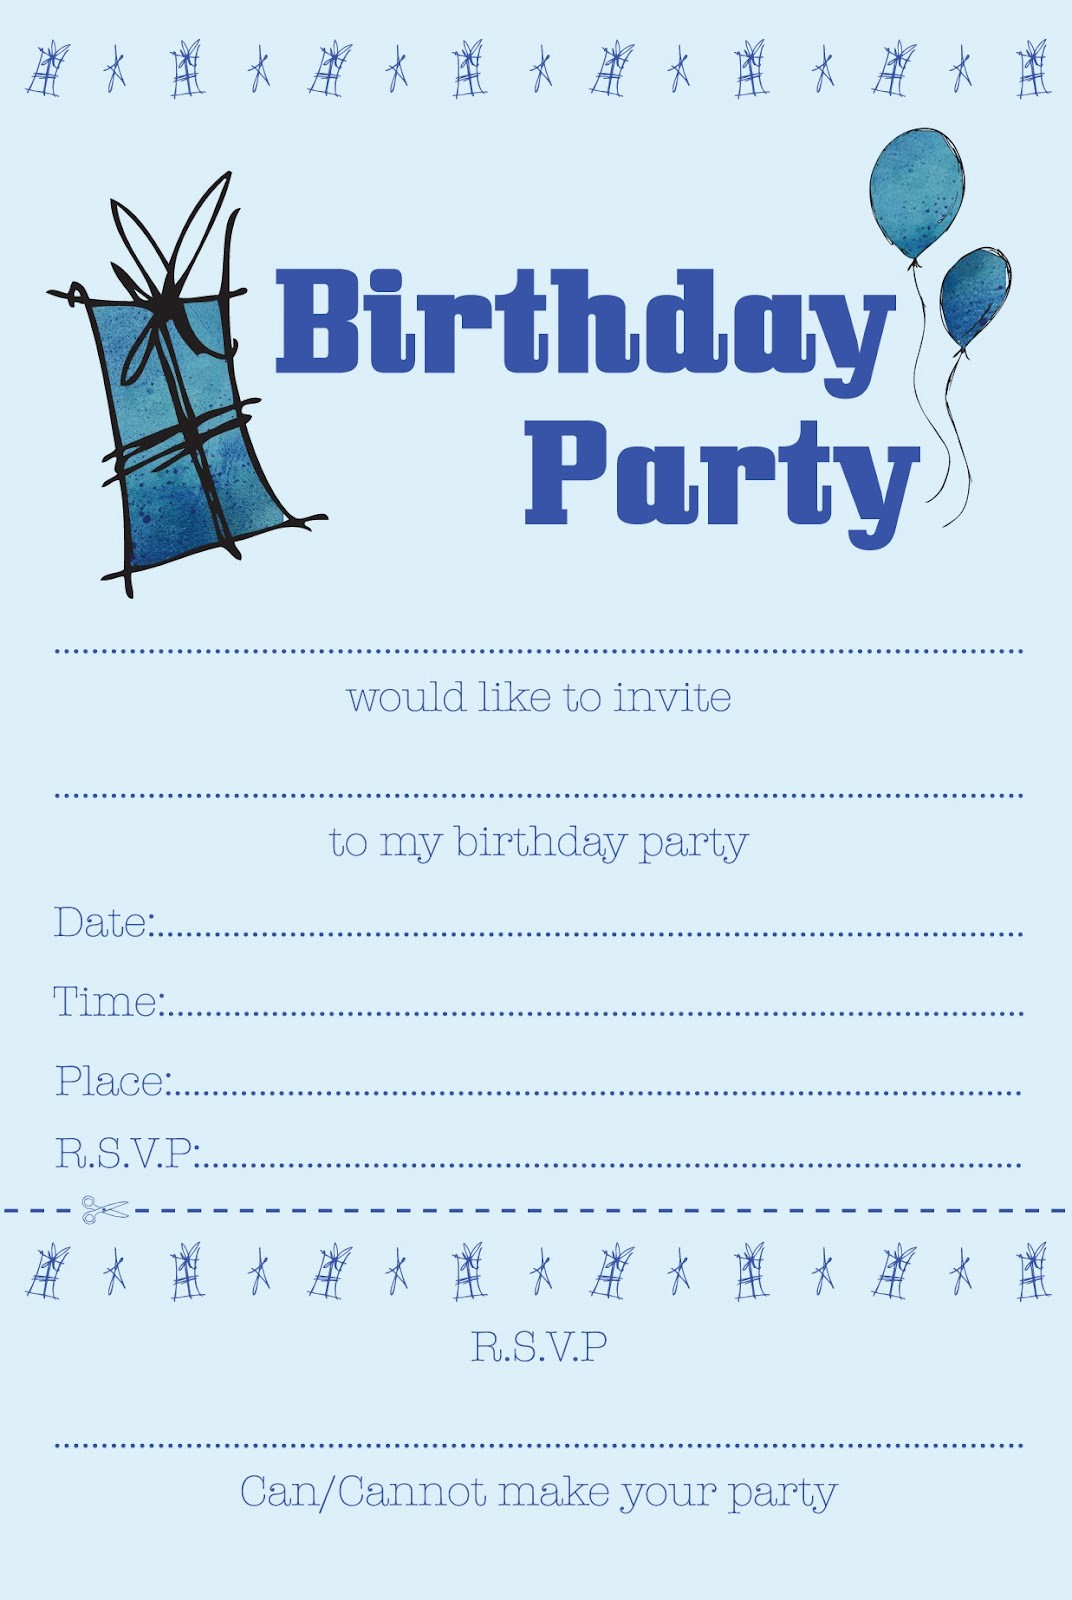 Invitation format for Birthday Party Elegant Squashed Rainbows Children S Party Invites